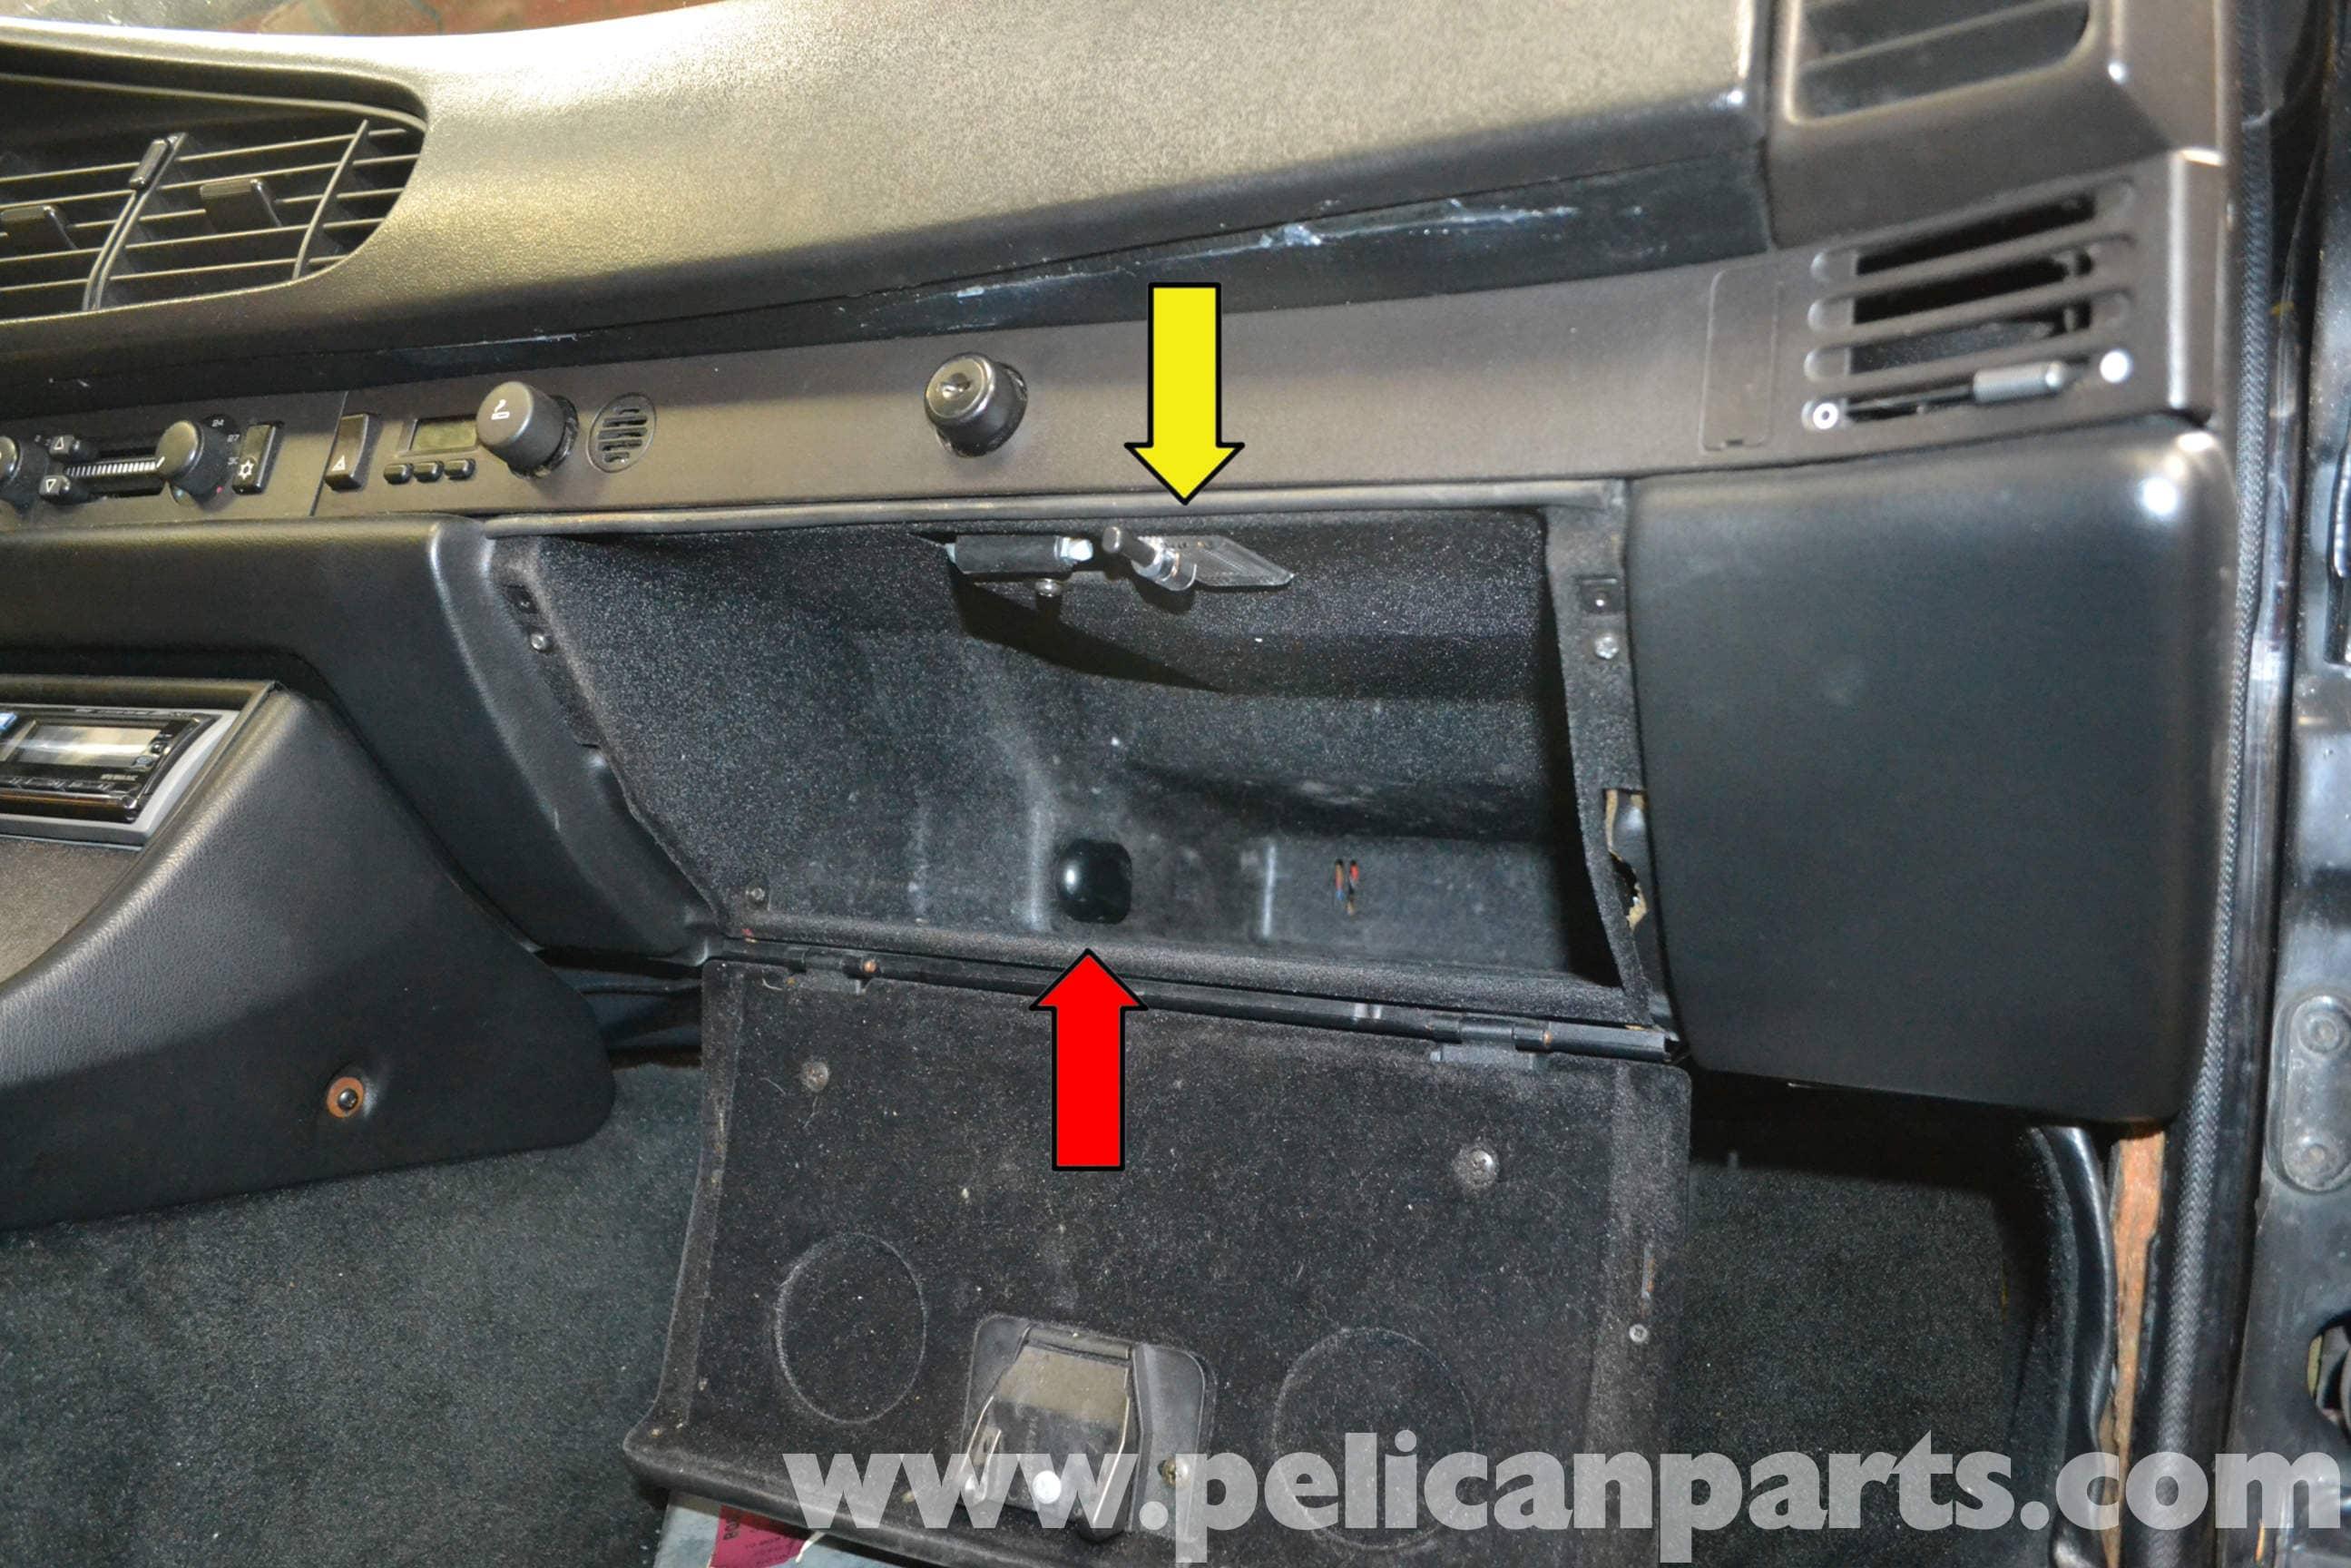 Porsche 944 Turbo Glove Box Removal (1986-1991) | Pelican Parts DIY